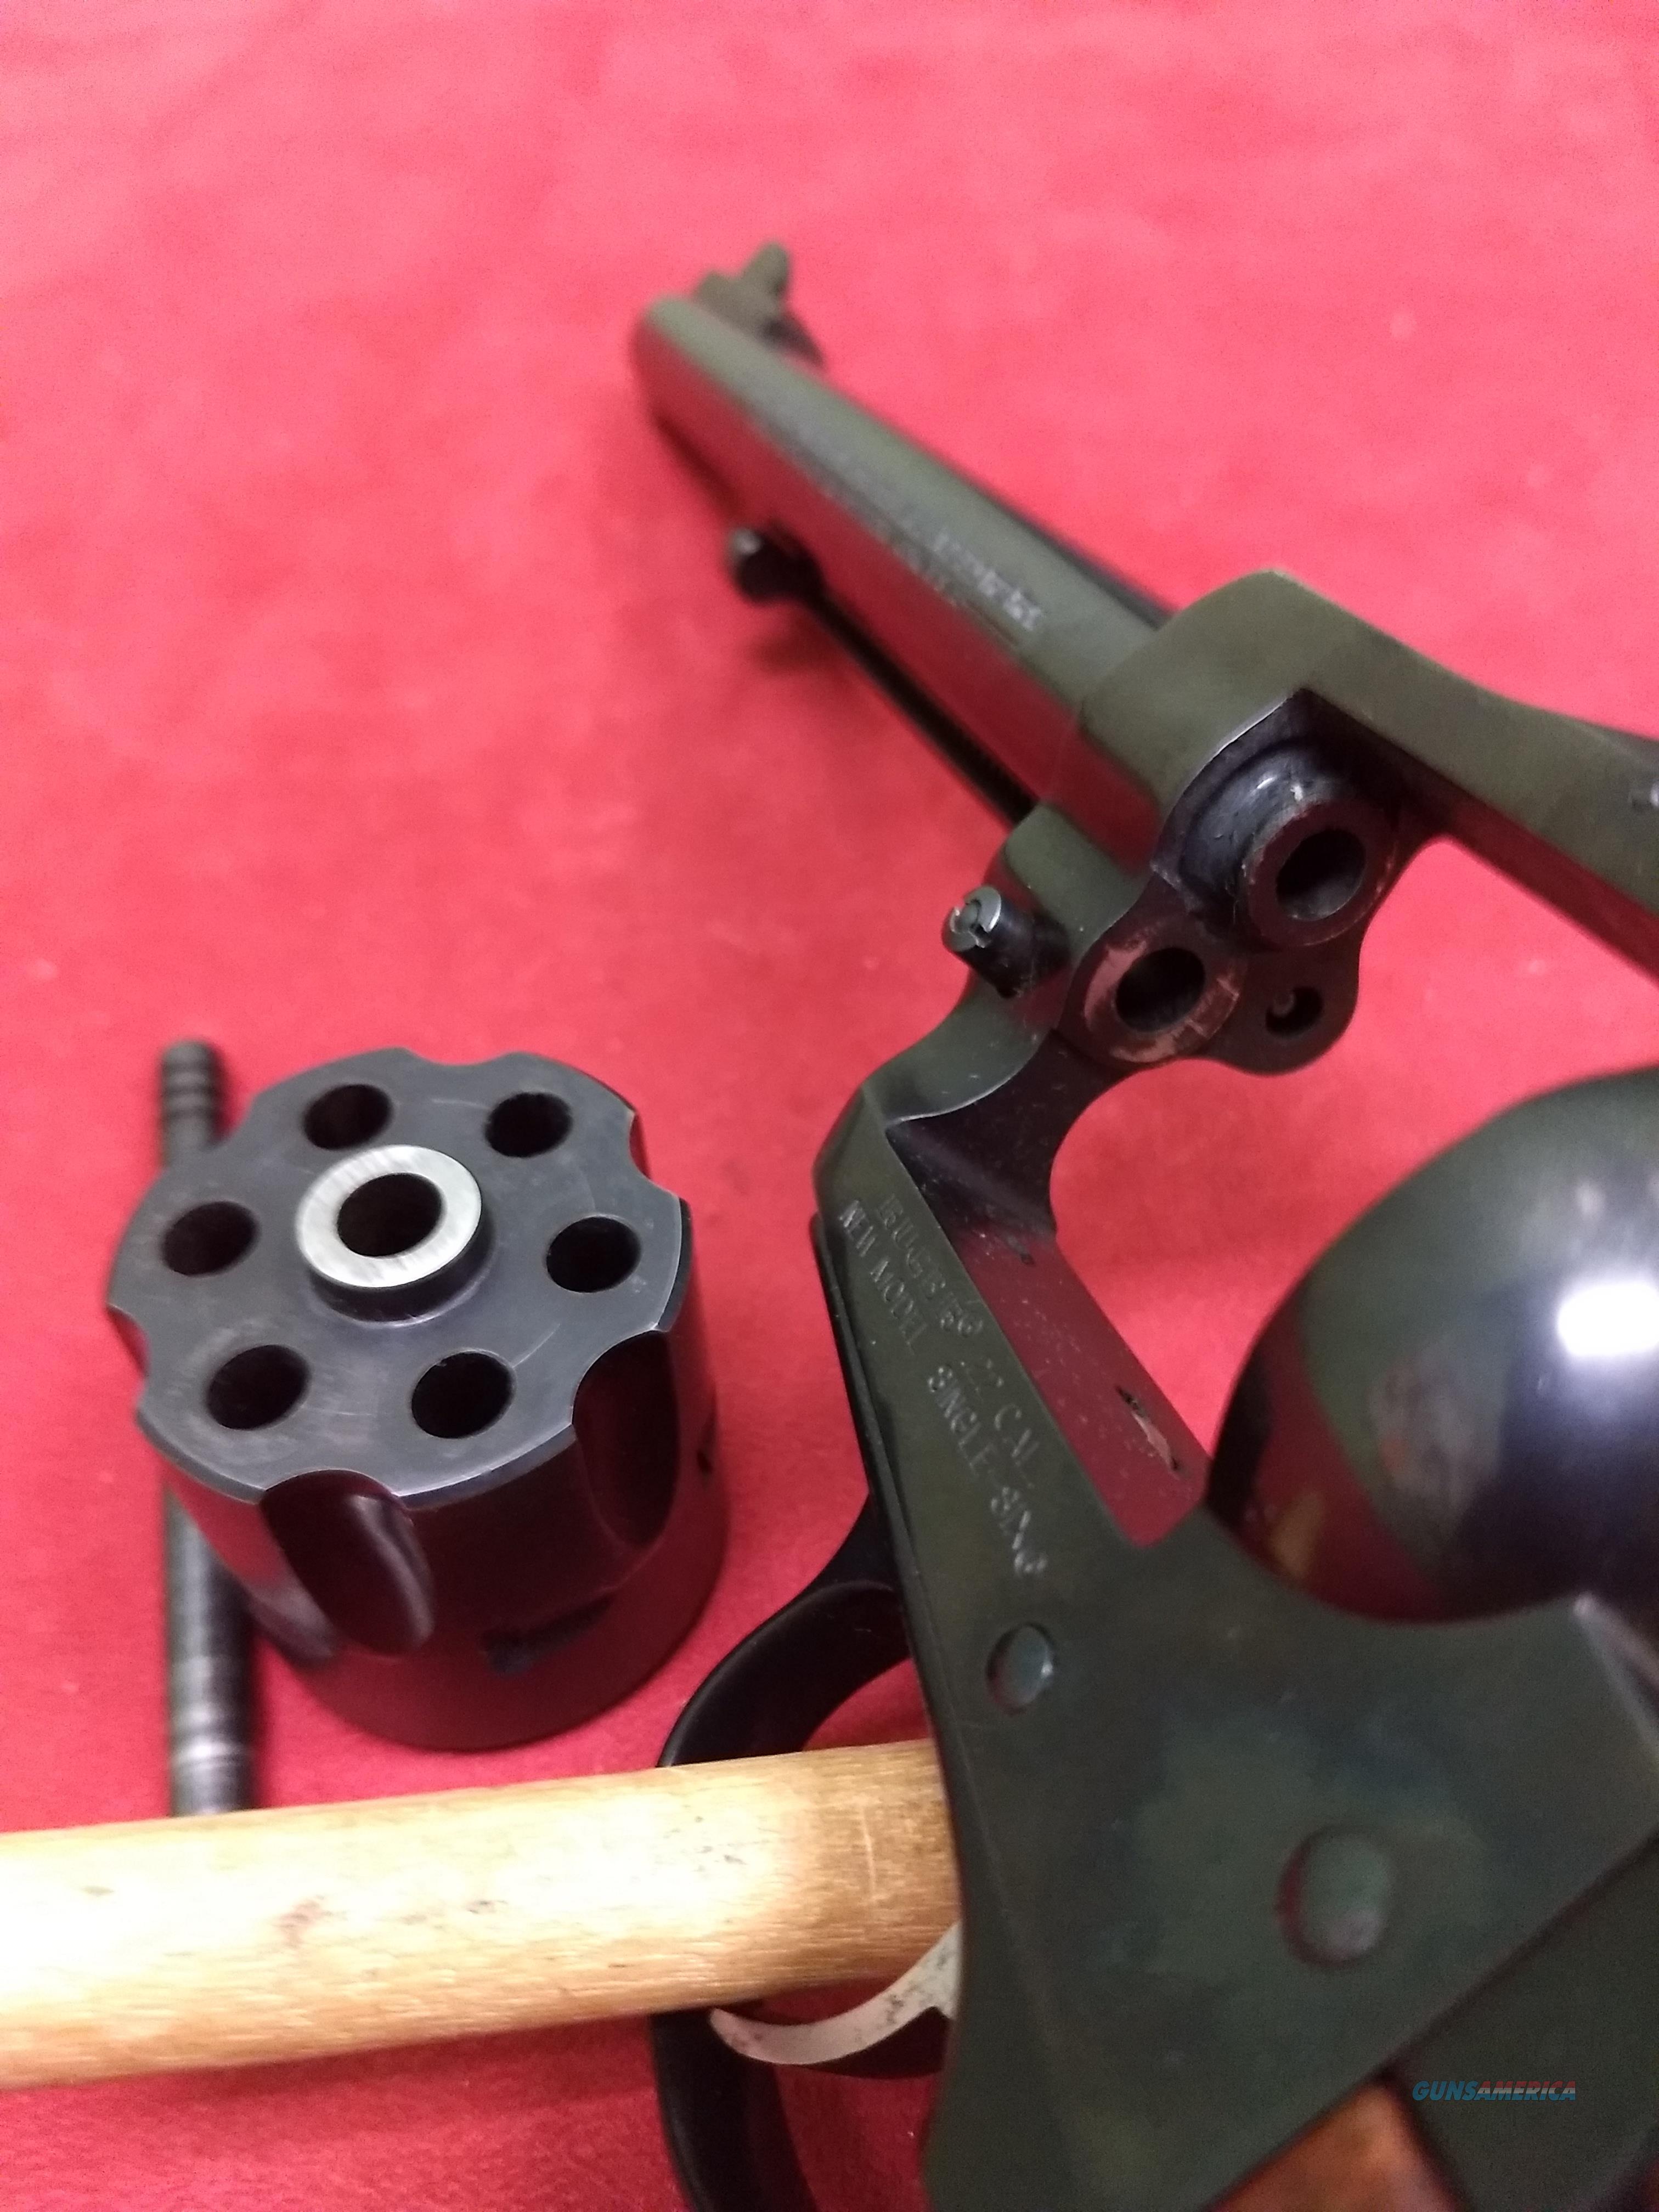 Ruger New Model Single Six Revolver, .22LR  Guns > Pistols > Ruger Single Action Revolvers > Single Six Type